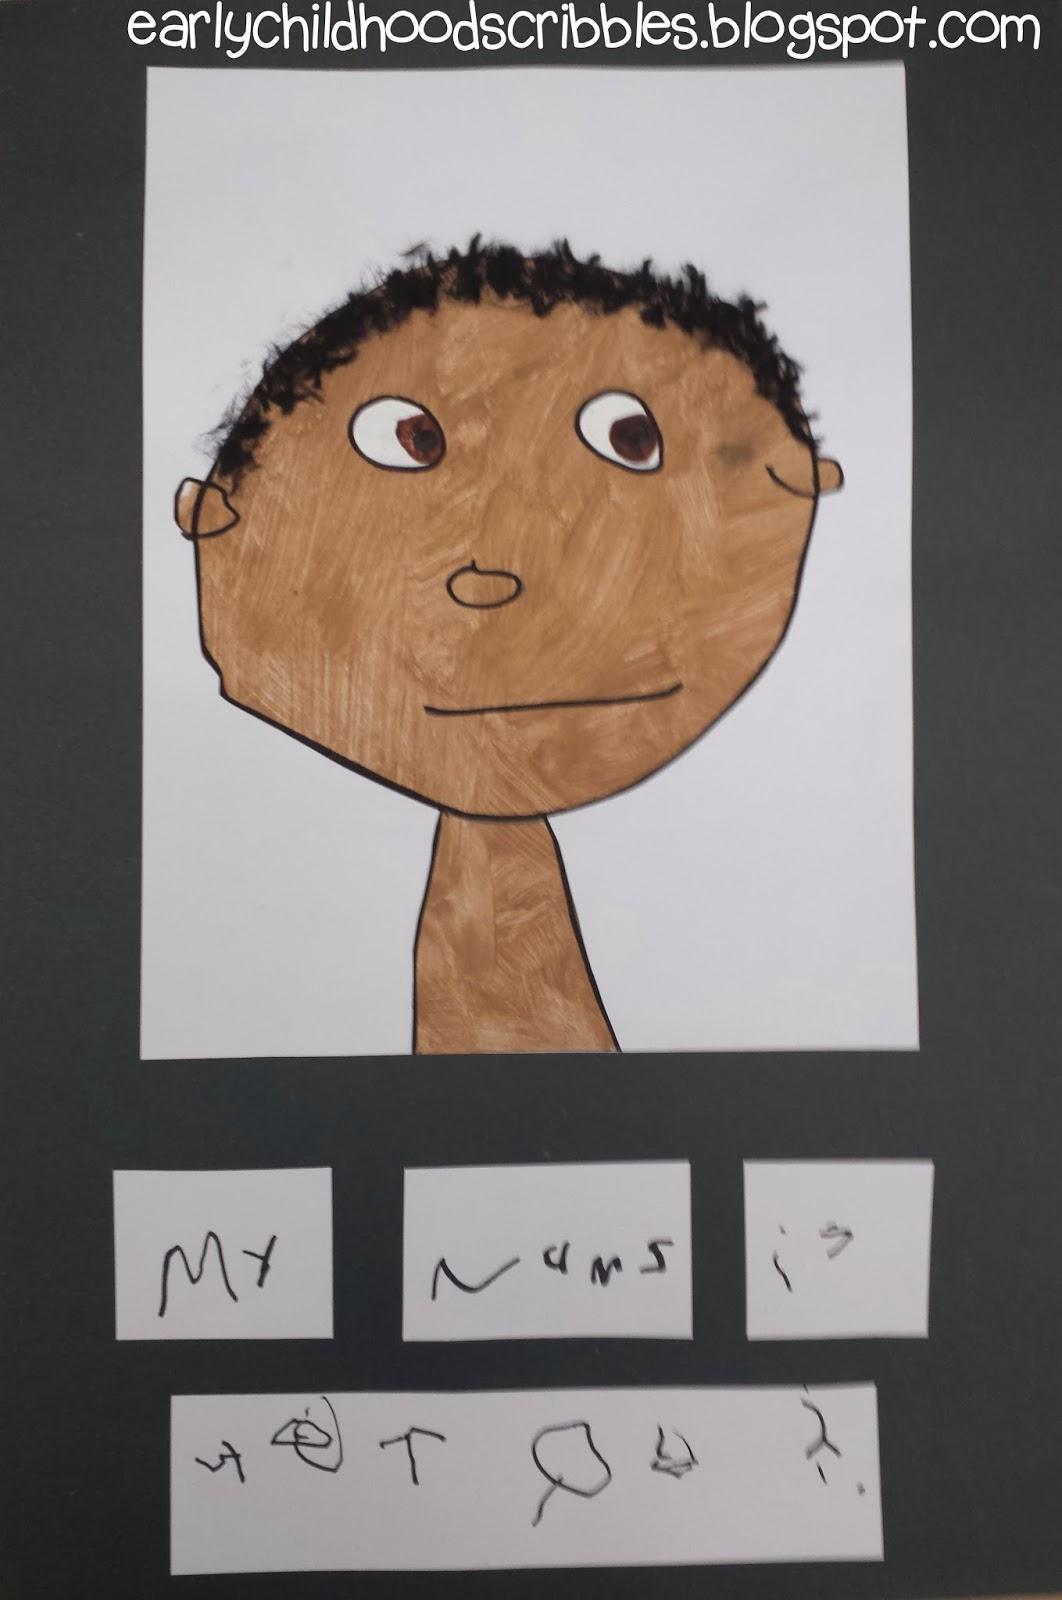 Early Childhood Scribbles Preschool Self Portraits